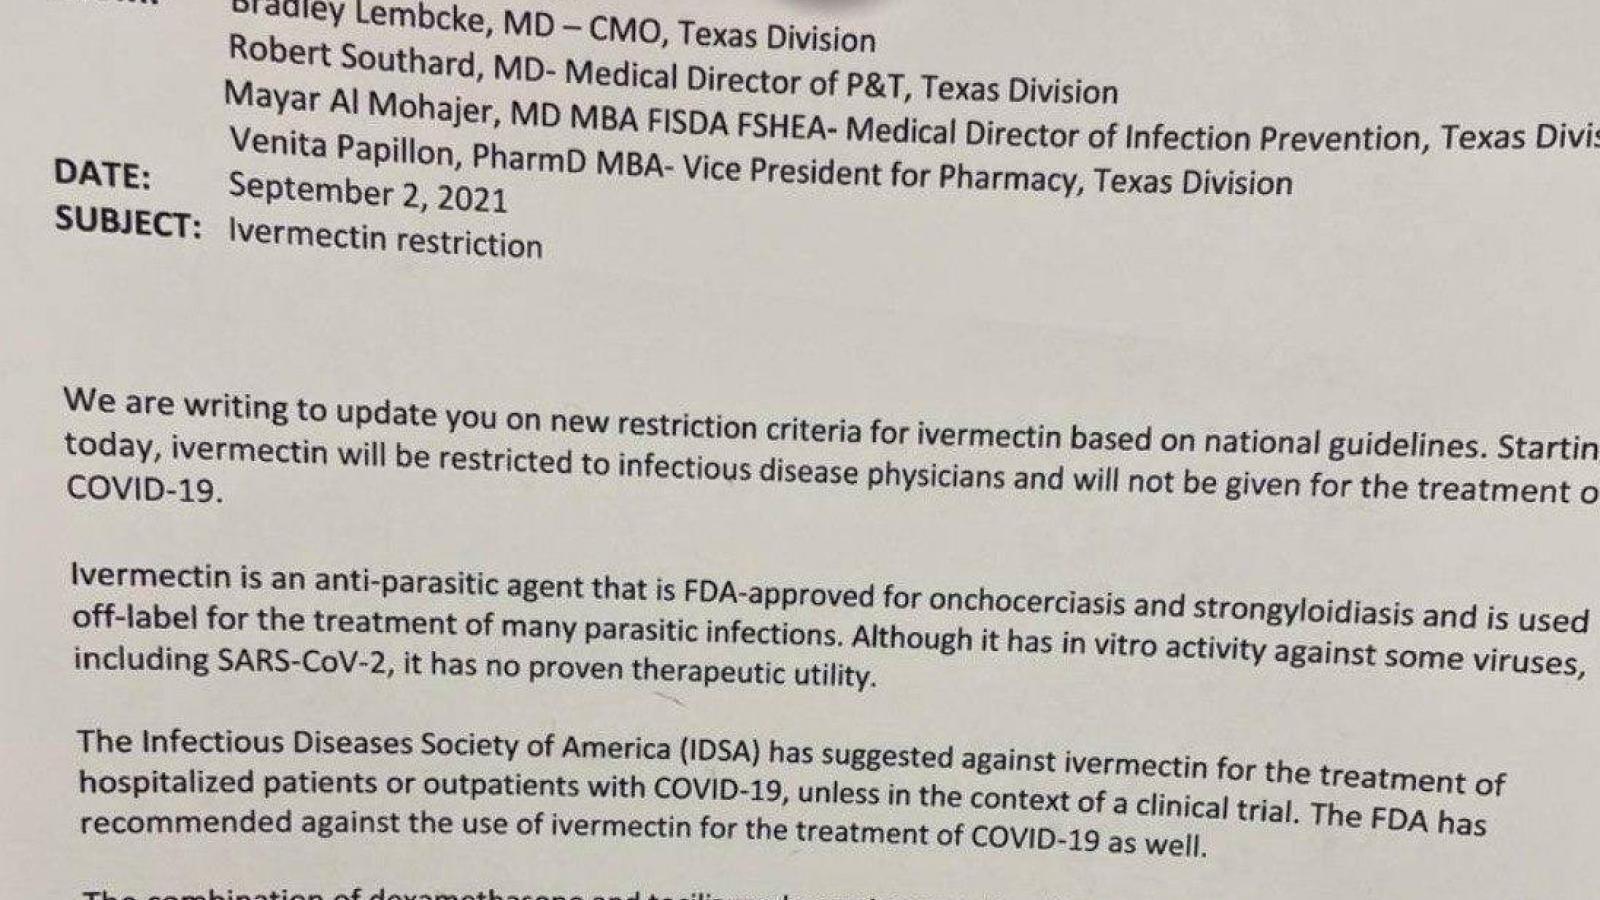 St. Luke's Health memo banning ivermectin to treat COVID